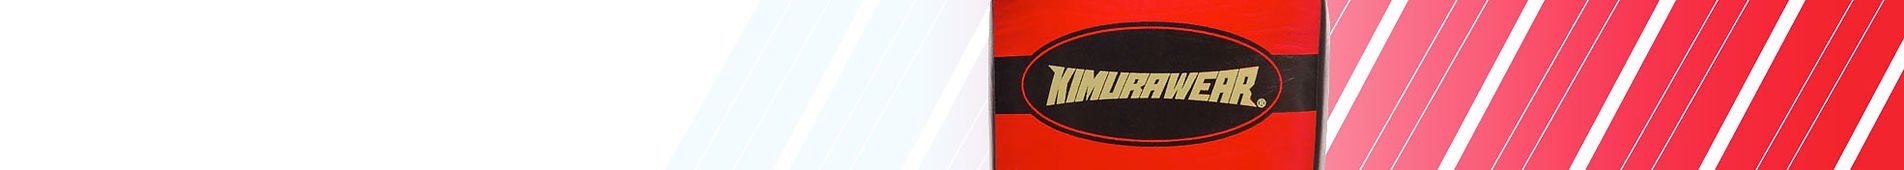 Muay-Thai-Pads-Banners.jpg